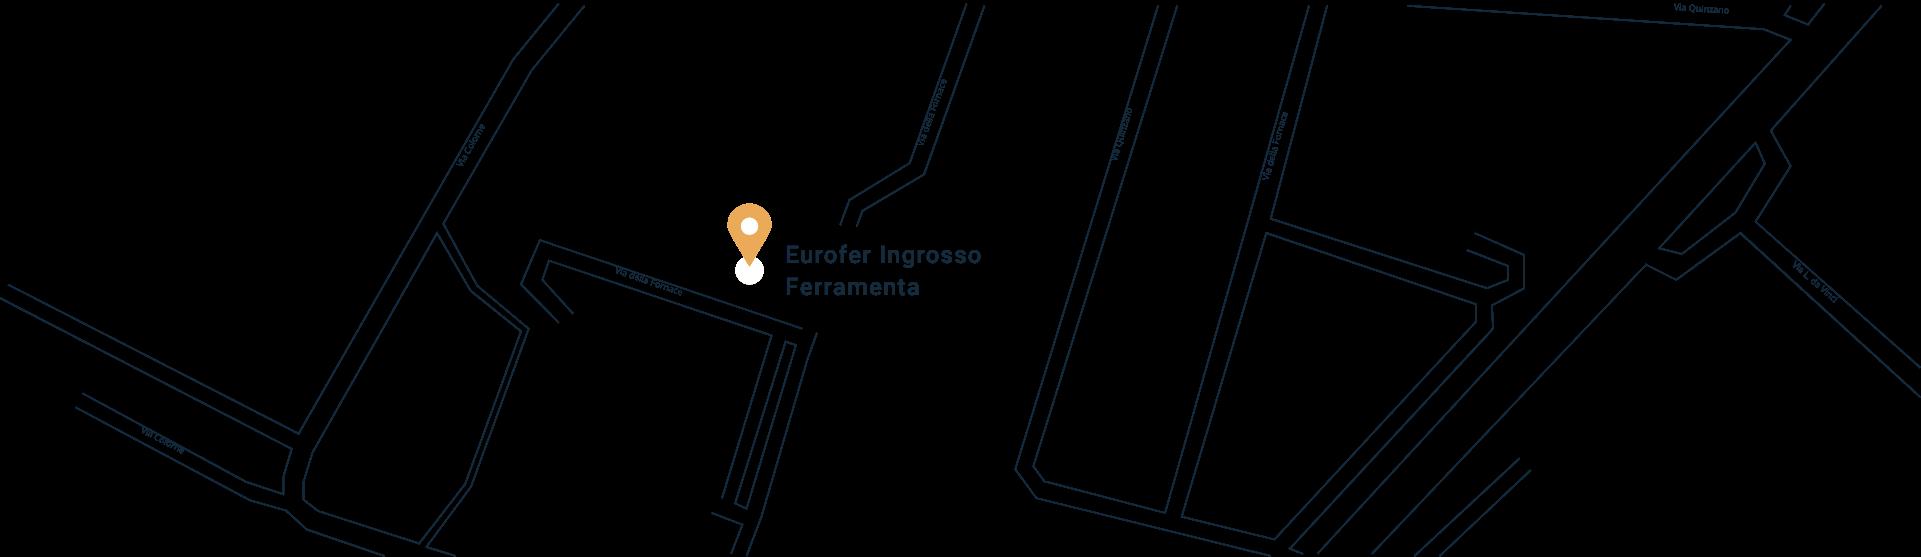 Mappa castelmella